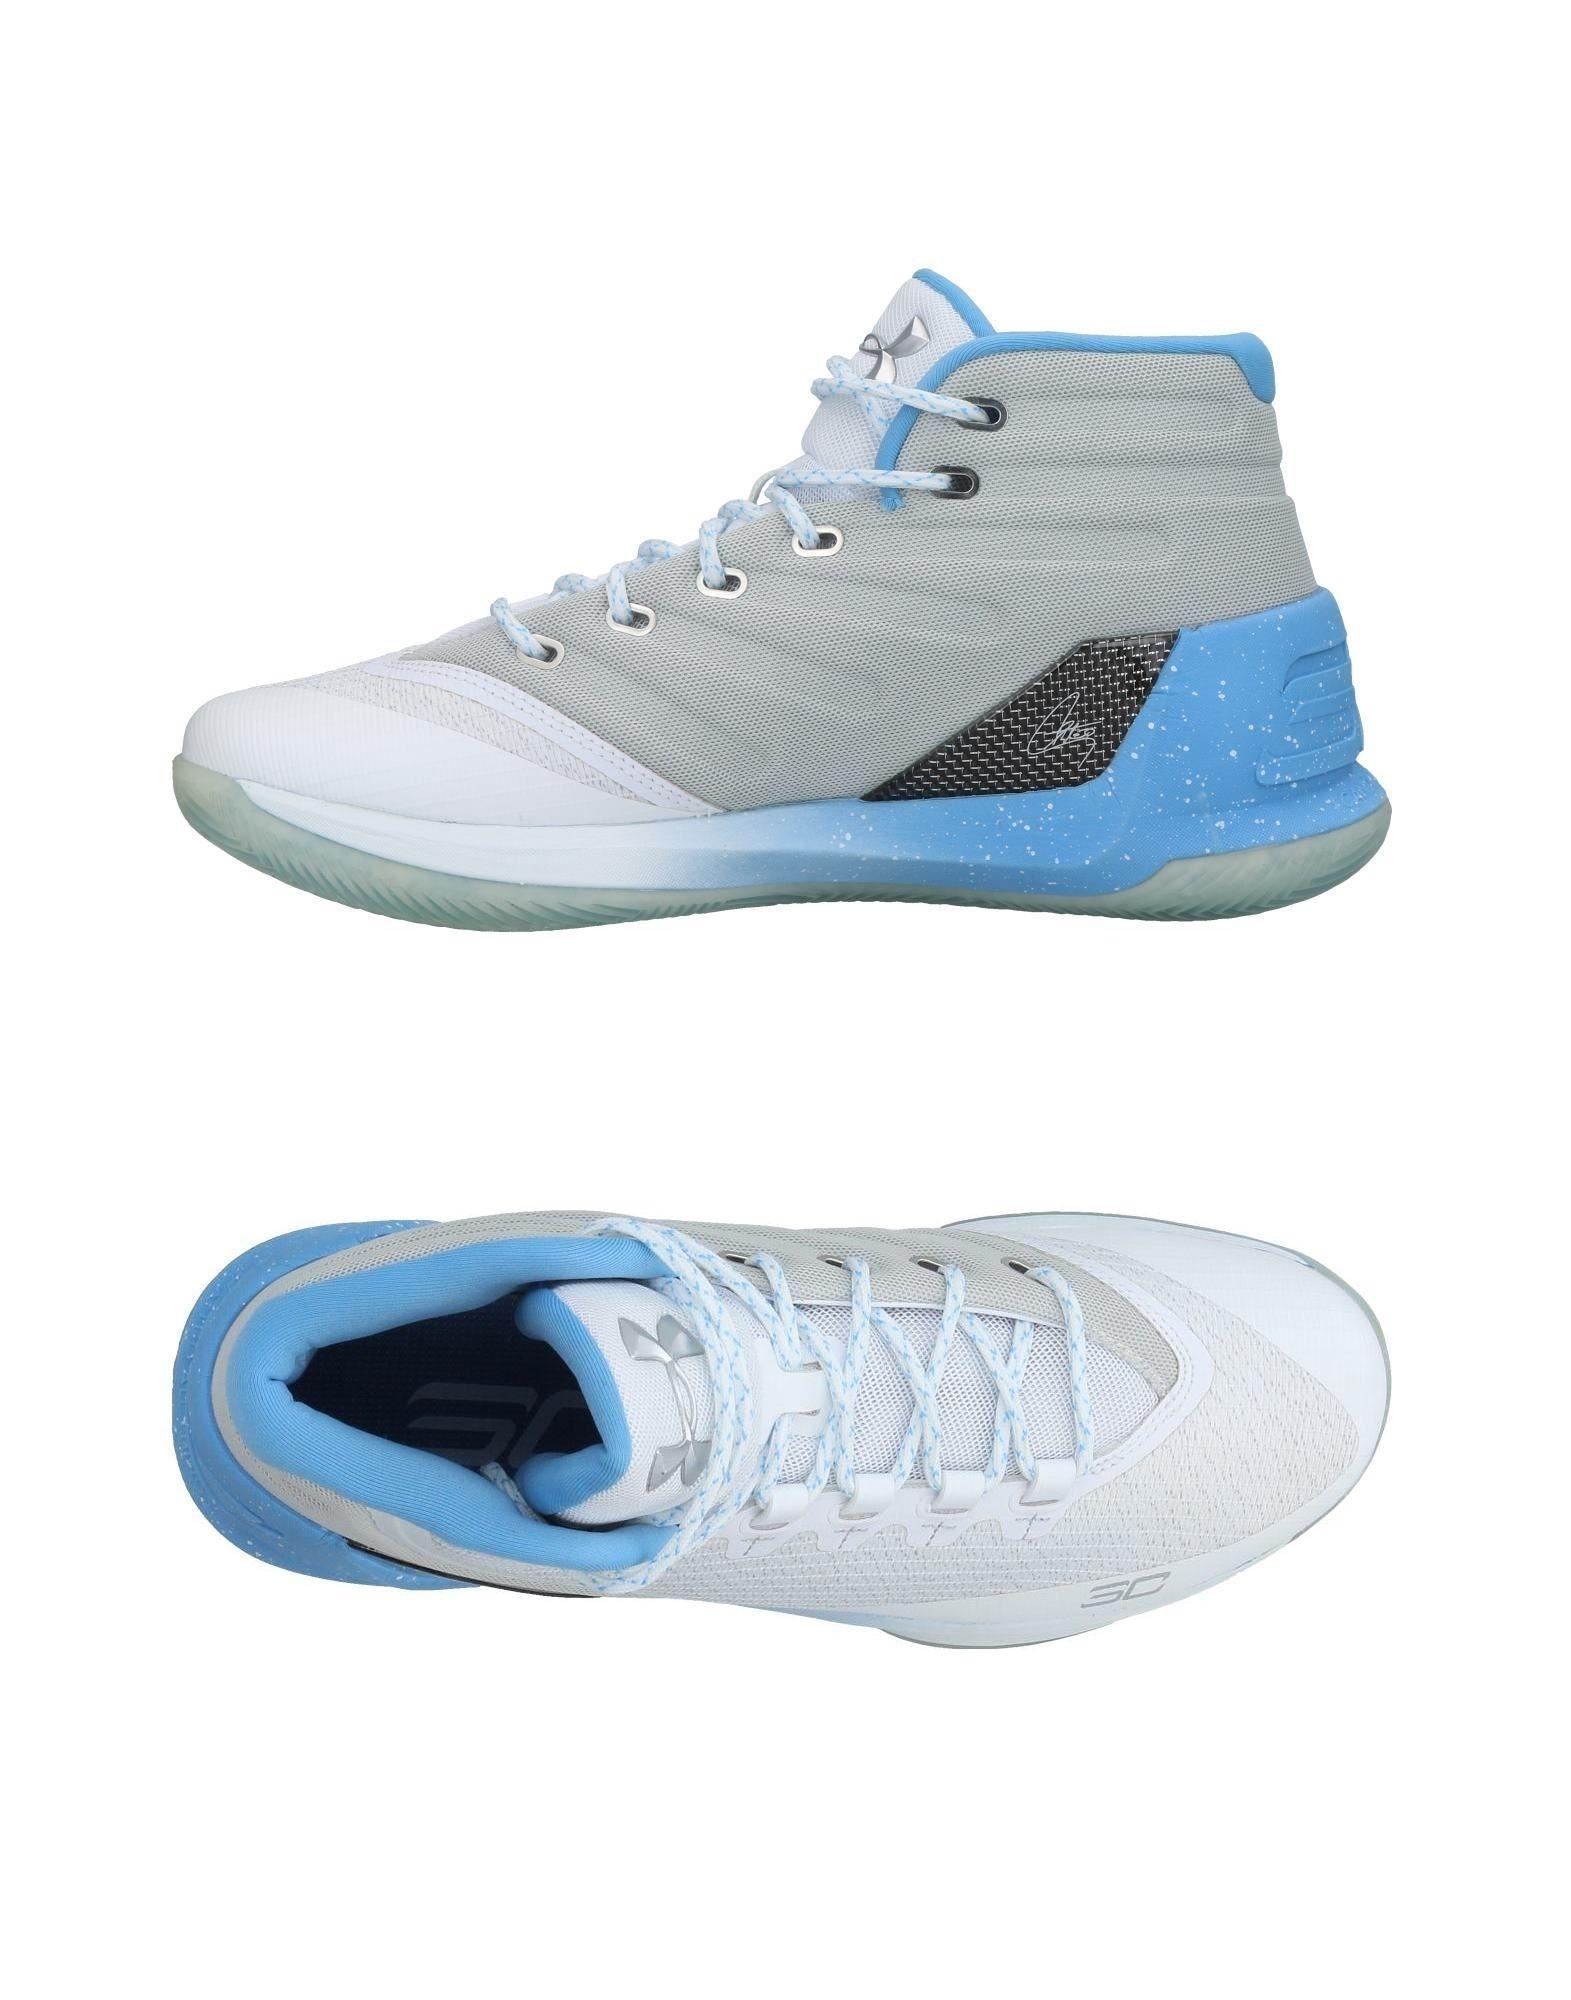 UNDER ARMOUR Высокие кеды и кроссовки кеды кроссовки высокие dc council mid tx stone camo